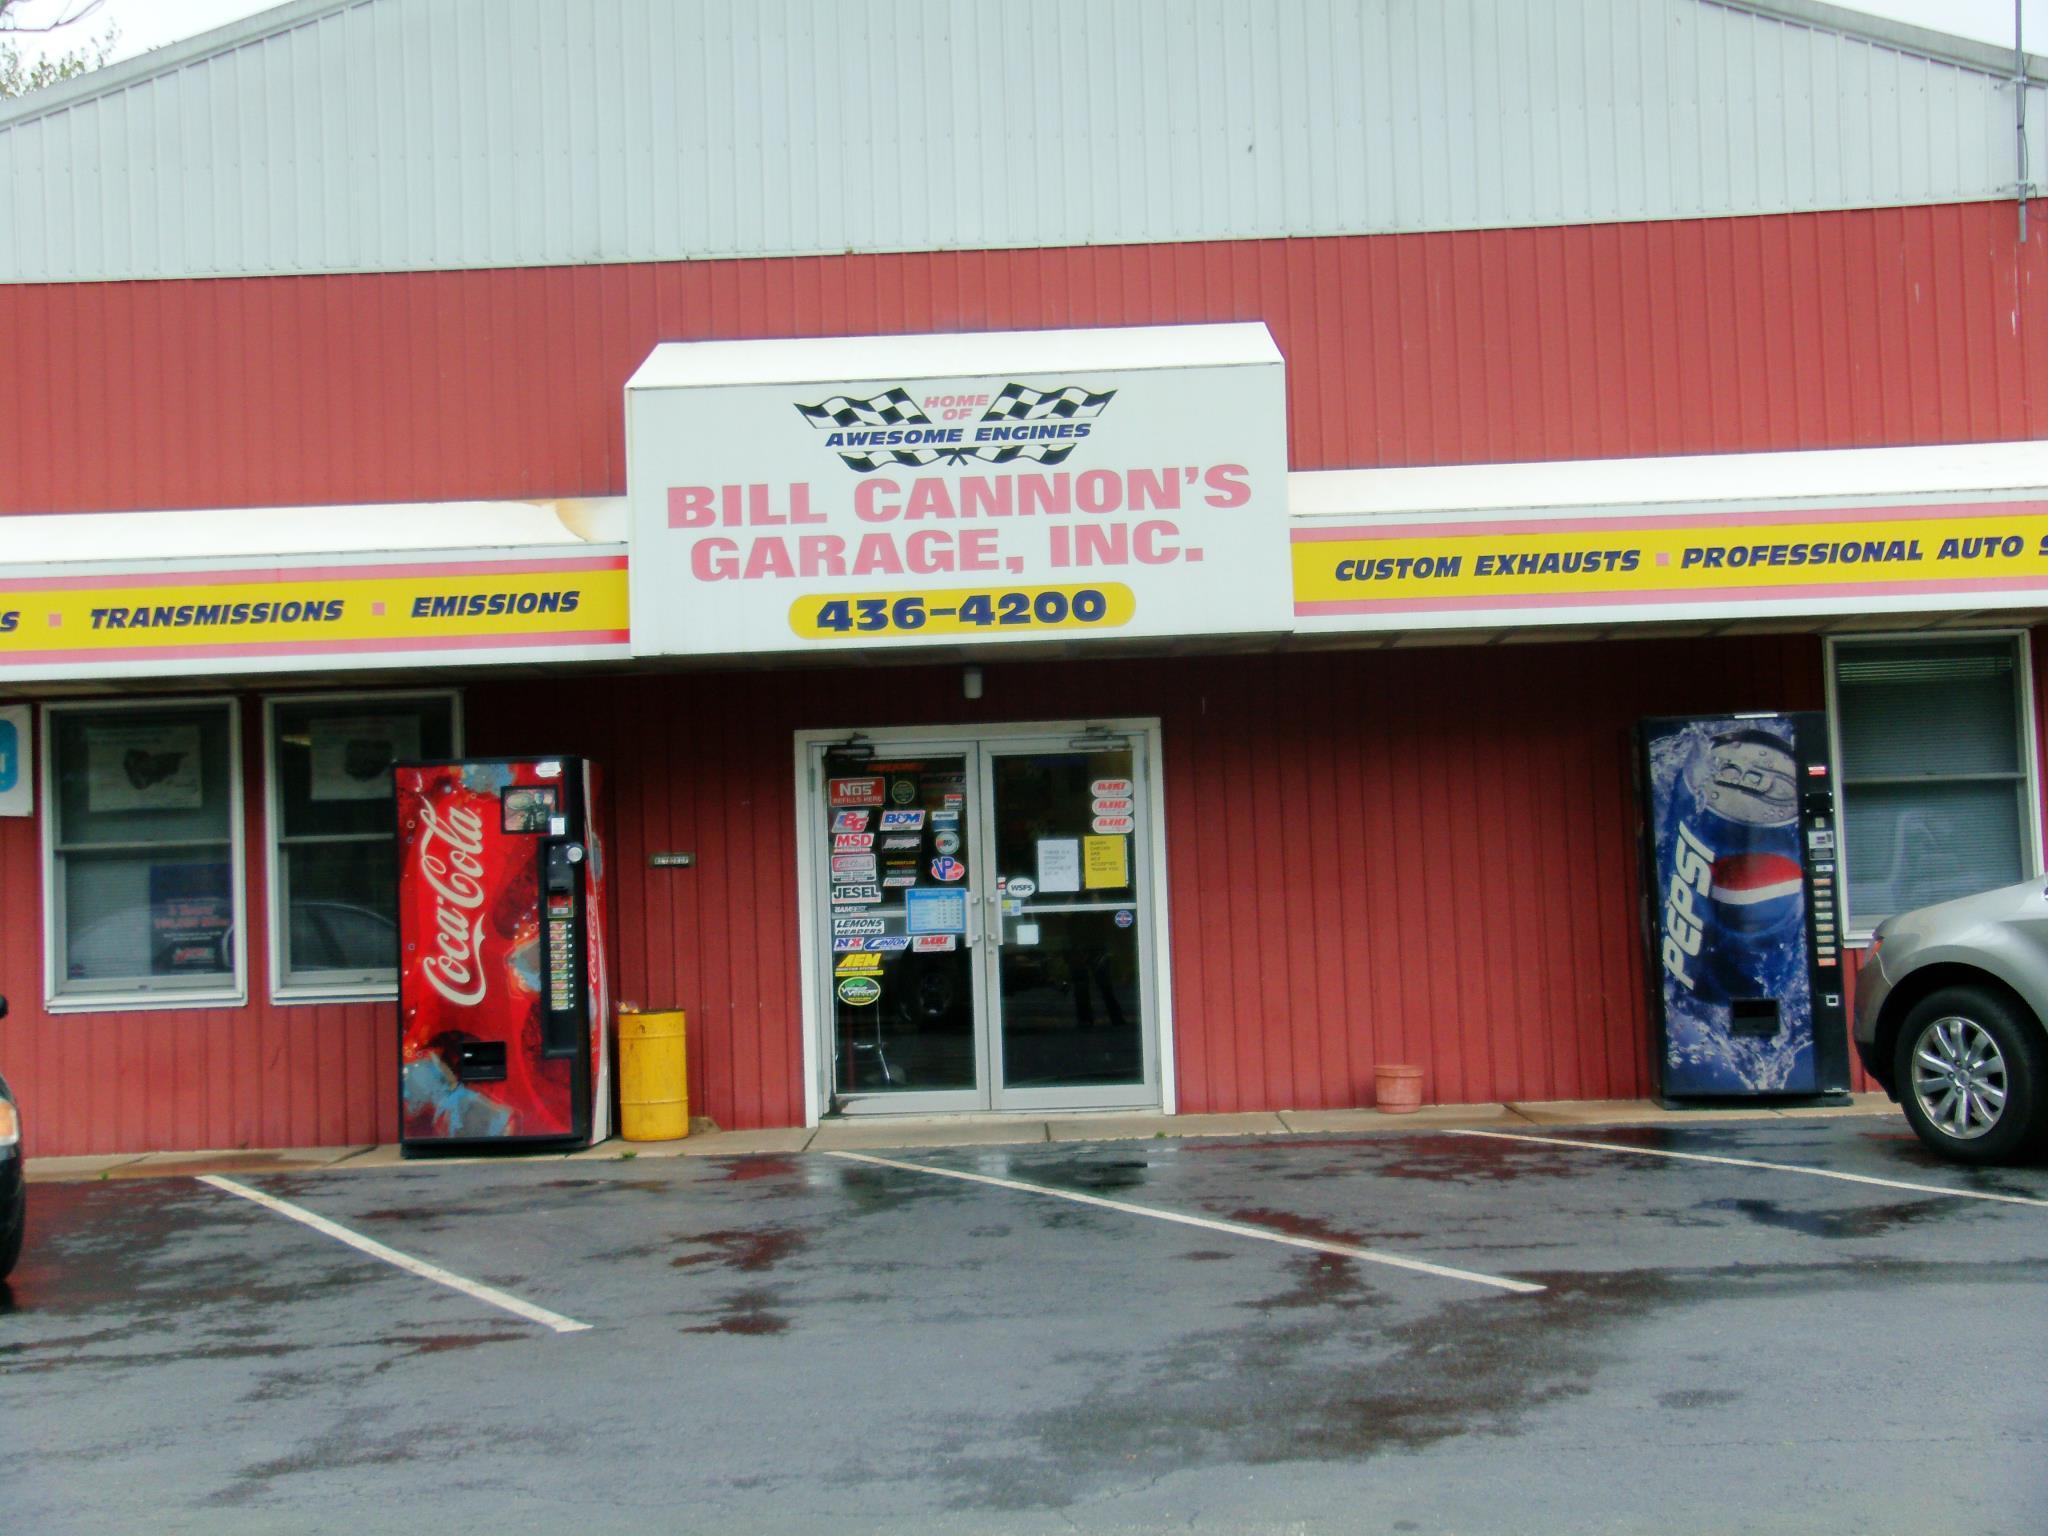 Bill Cannon's Garage, Inc image 1